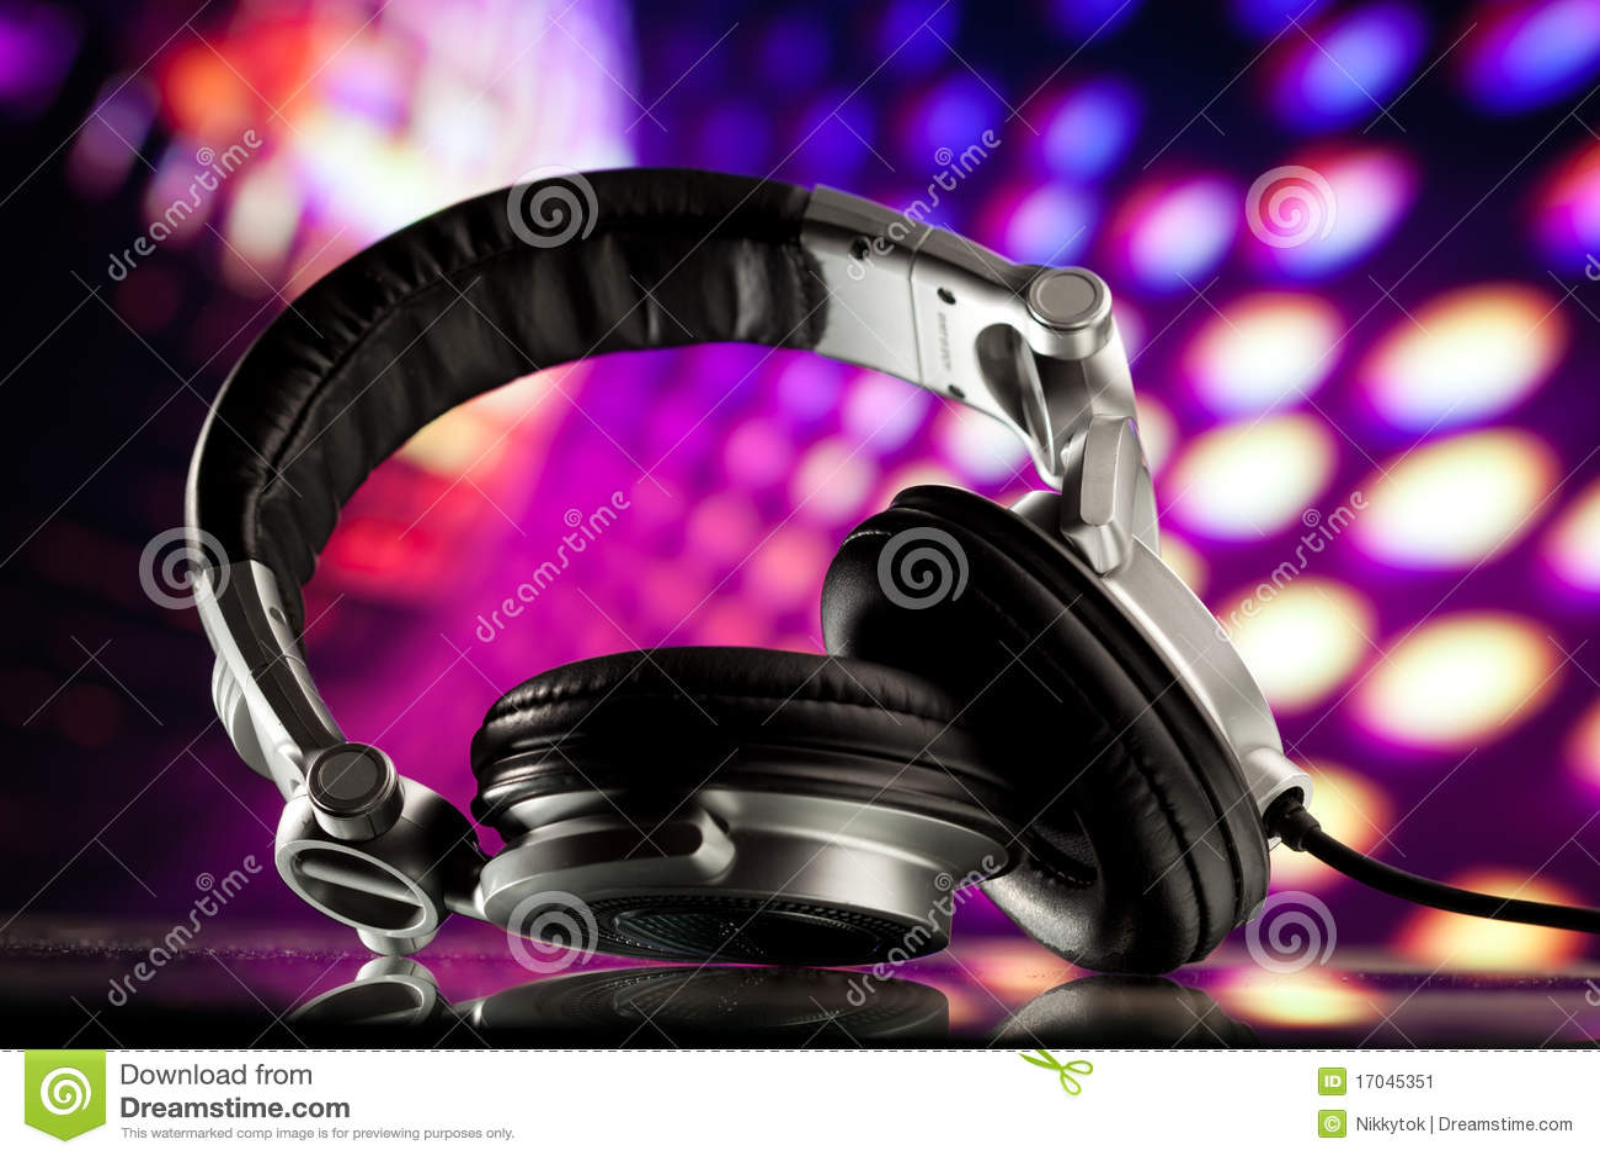 headphones on purple background stock image